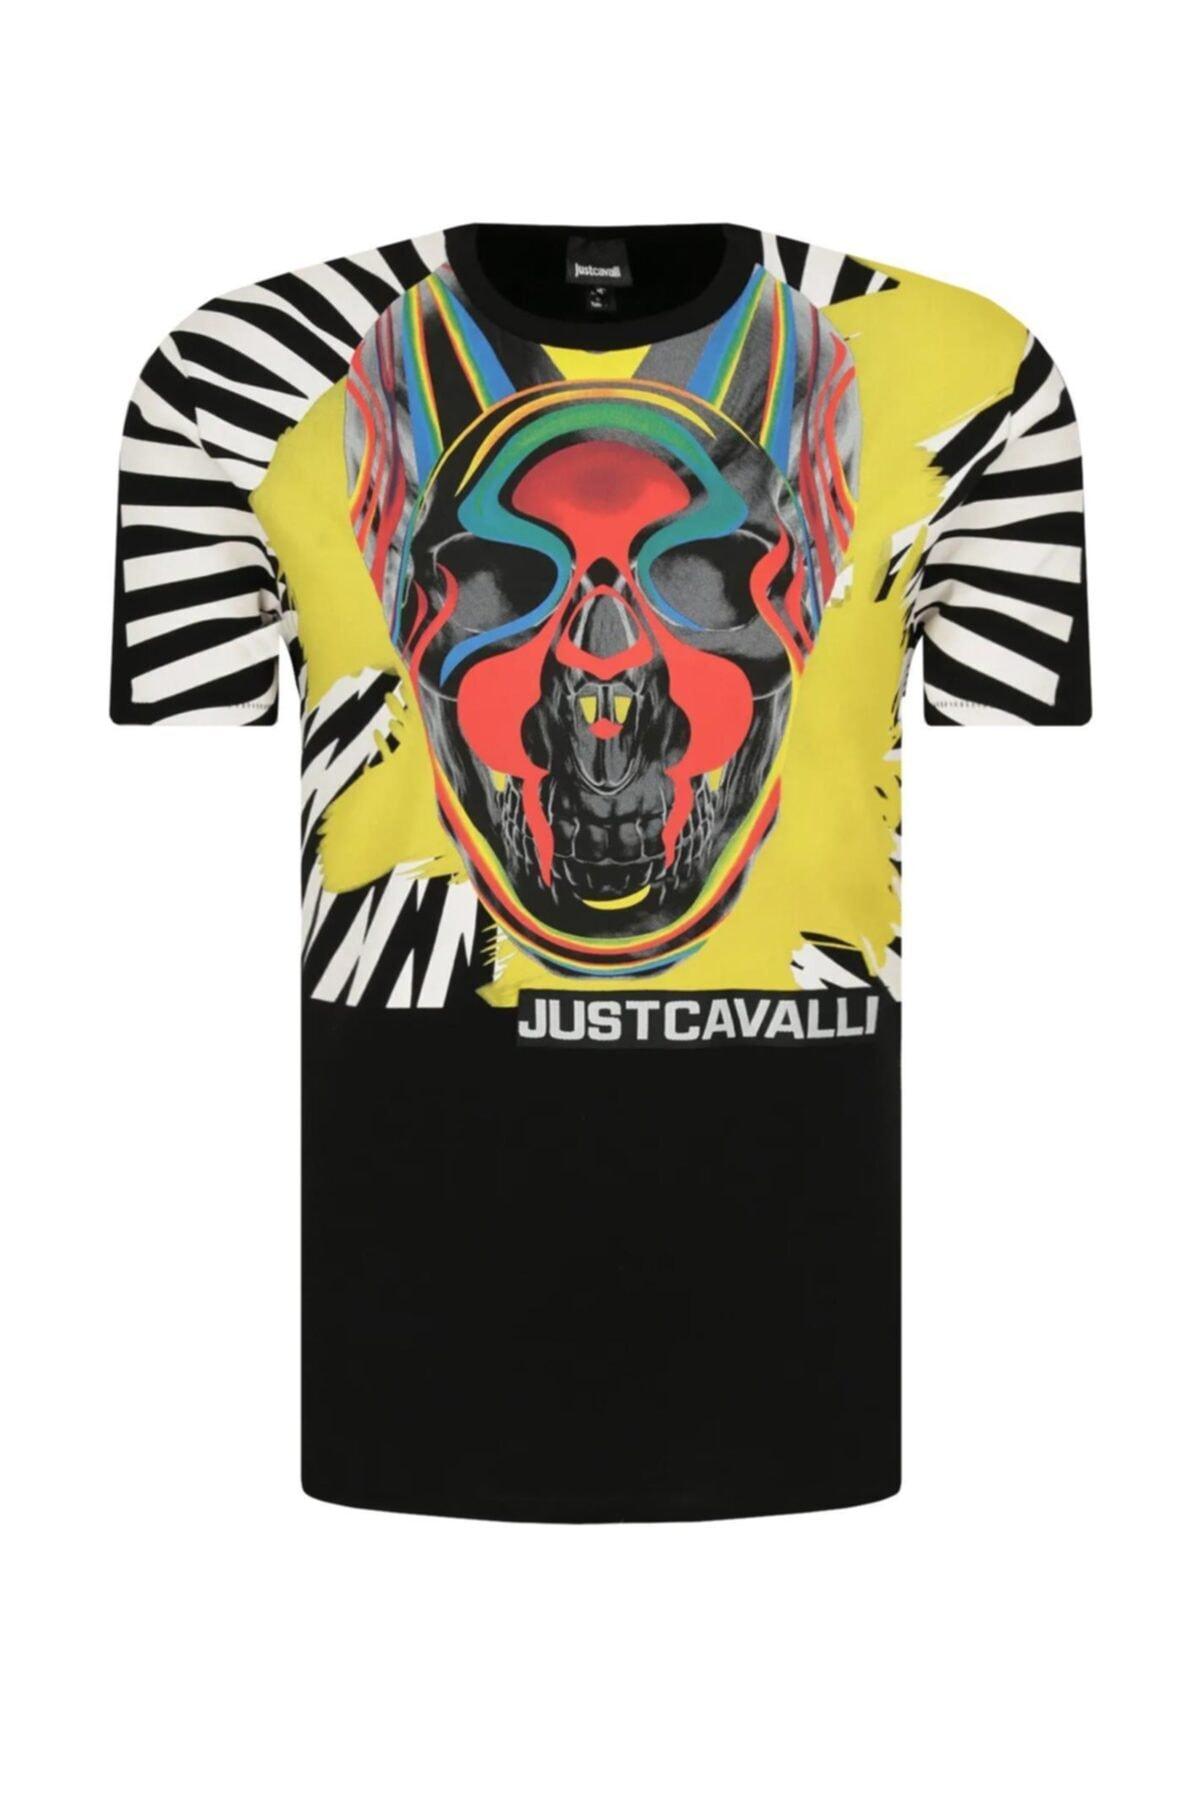 Just Cavalli Erkek Beyaz T-shirt S03gc0613 1